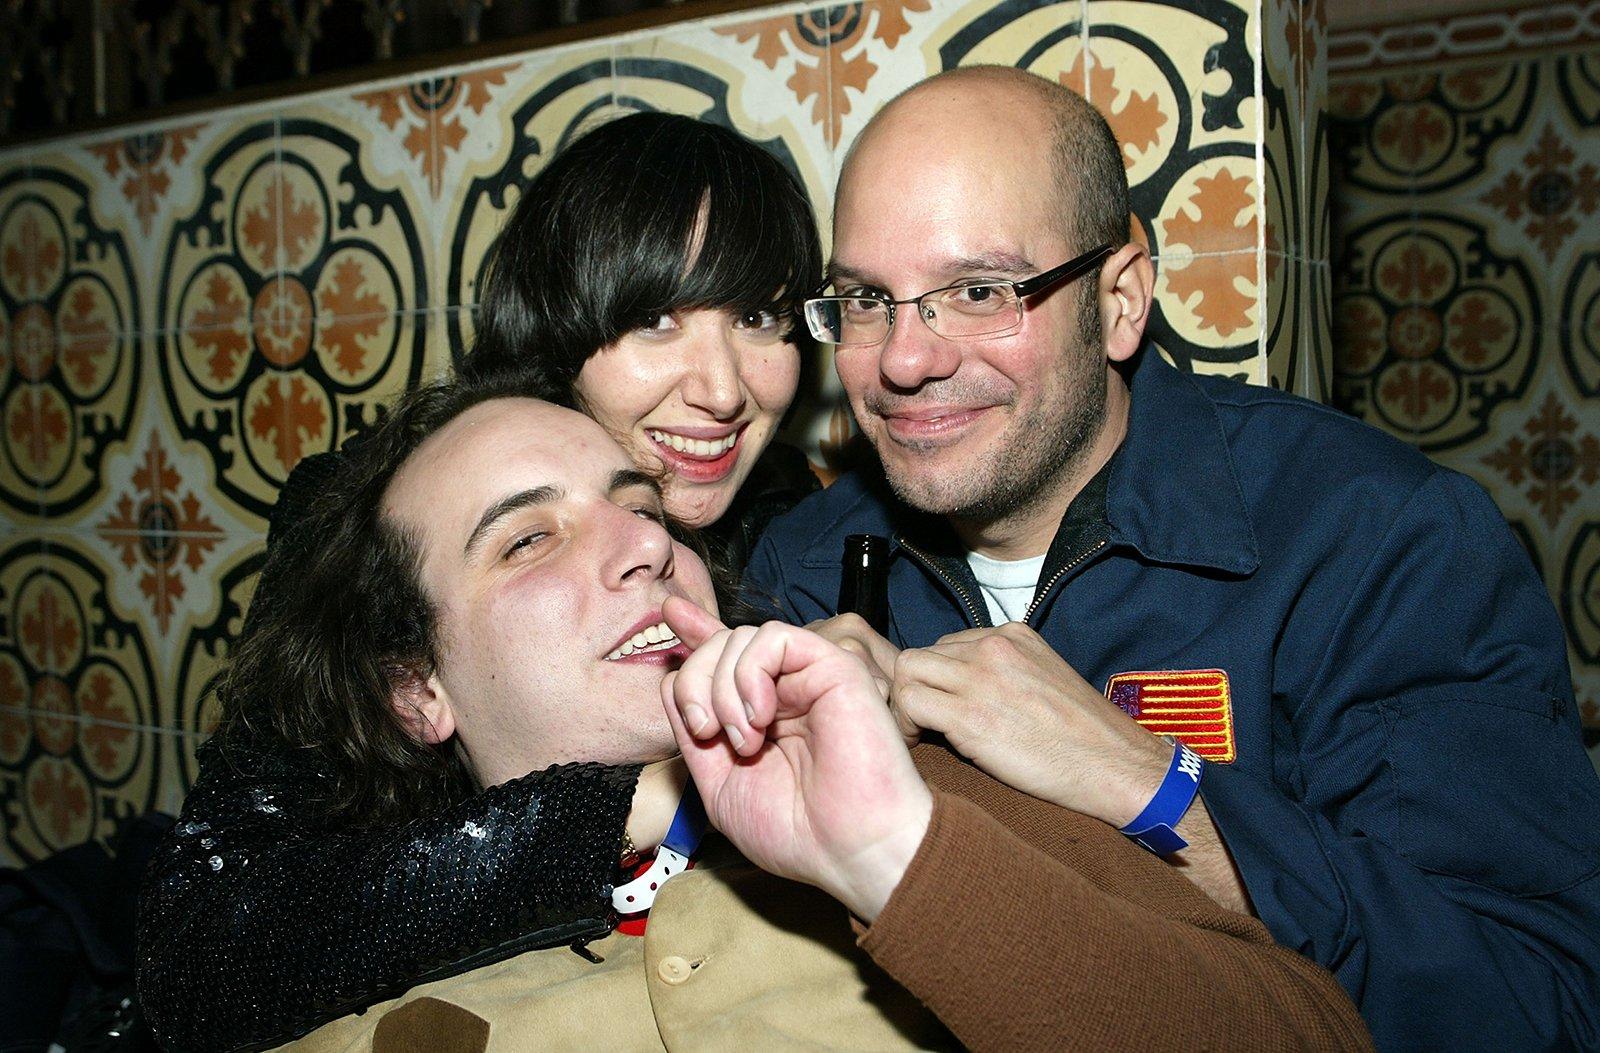 #ThrowbackOfTheDay: @HarMarSuperstar, @KarenO & @DavidCrosss at a #Grammys After-Party, 2005 https://t.co/s9xyV39wRu